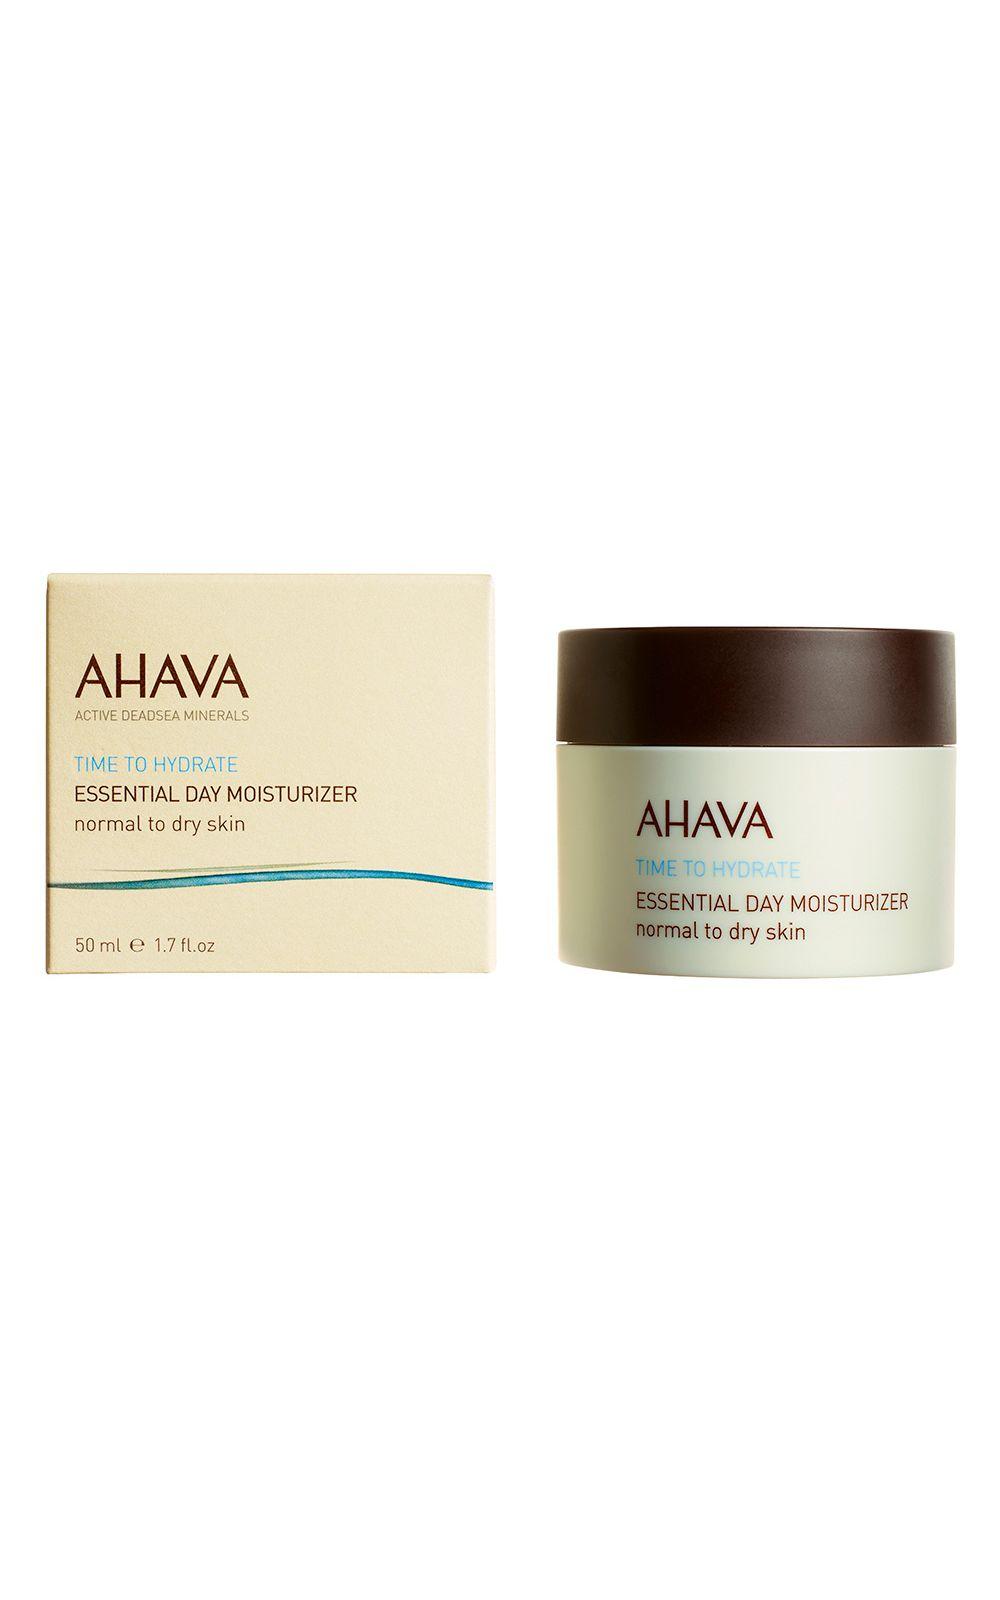 Foto 2 - Hidratante Facial Ahava - Essential Day Moisturizer For Normal to Dry Skin - 50ml